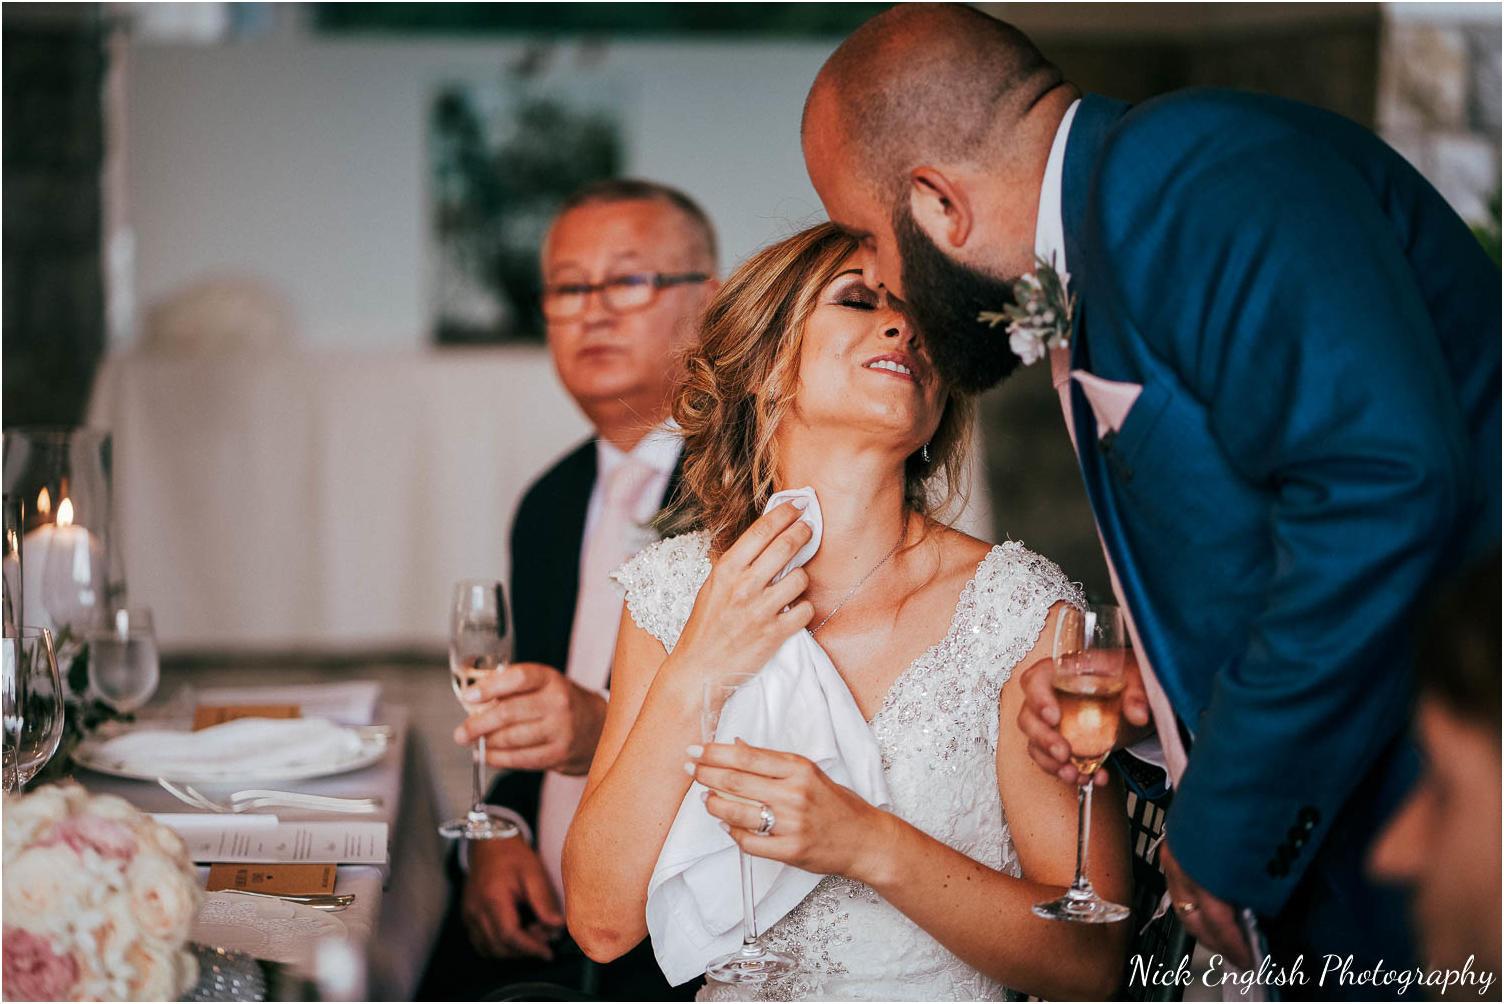 Destination_Wedding_Photographer_Slovenia_Nick_English_Photography-78.jpg